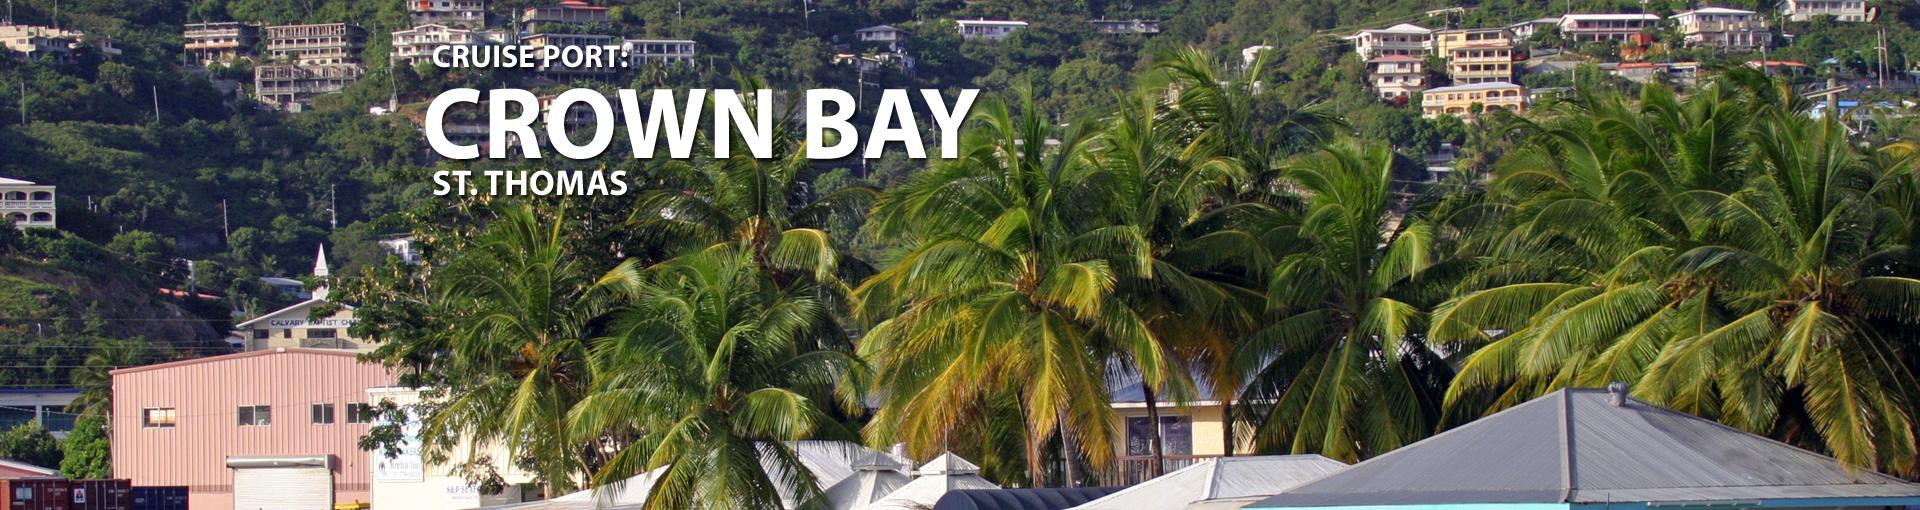 Cruises to Crown Bay, St. Thomas